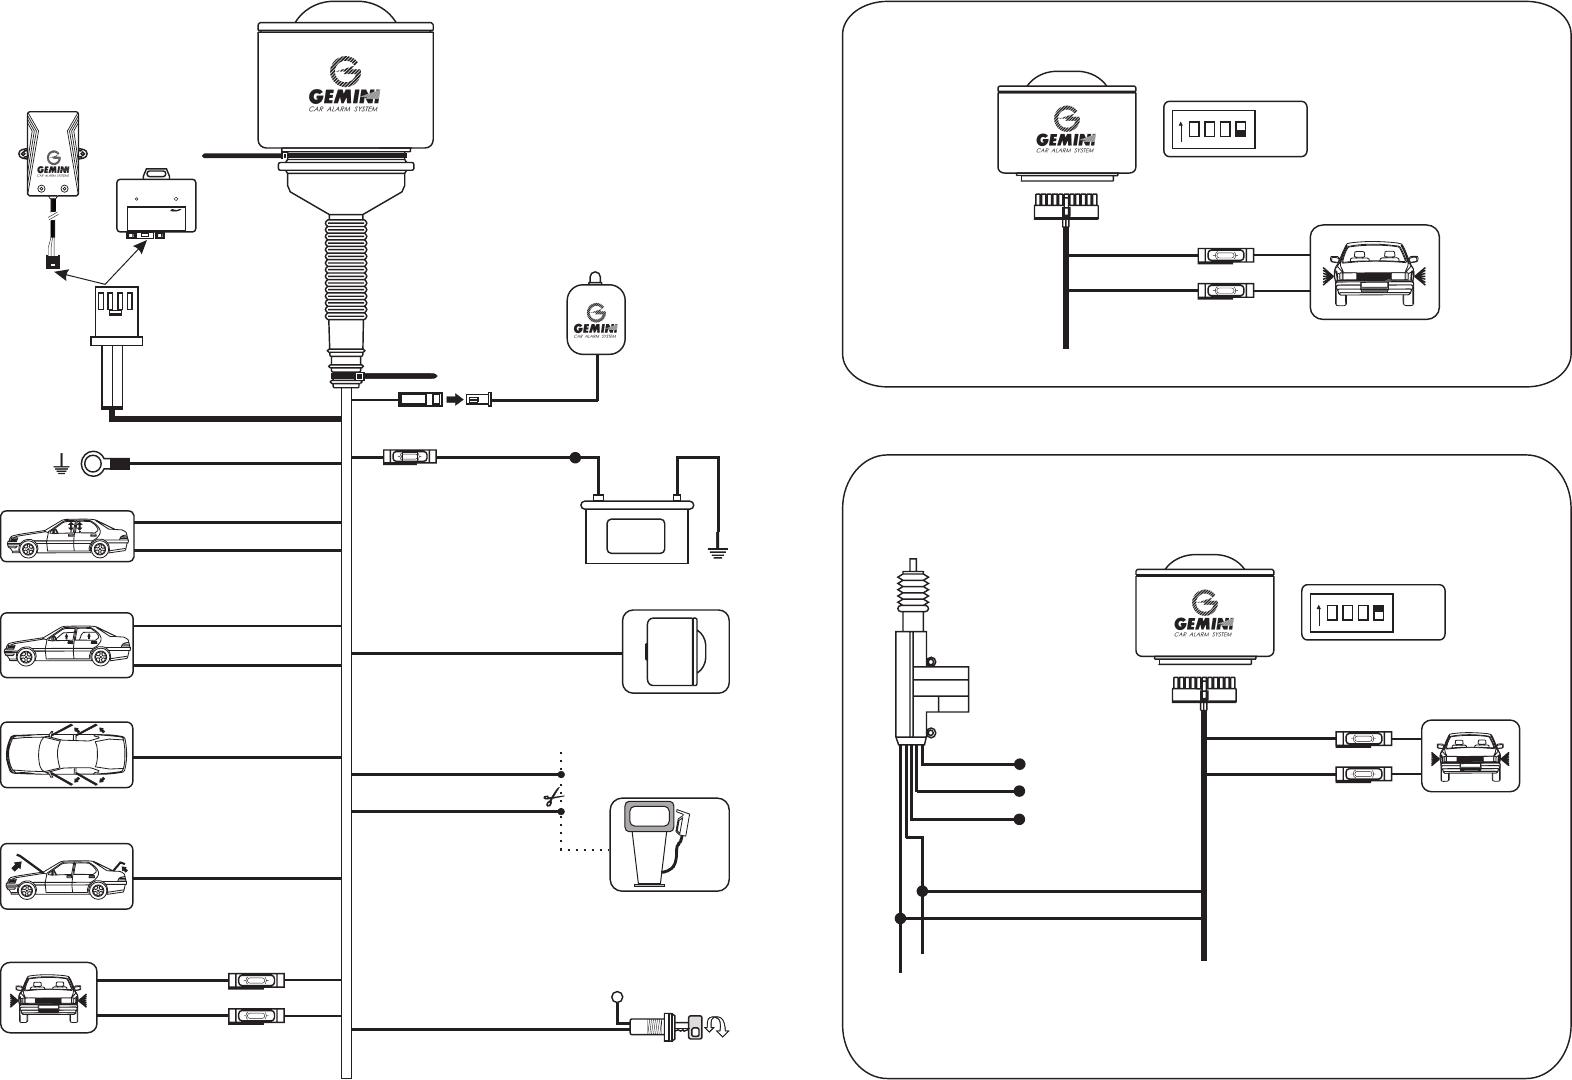 Manual Gemini 7056 (page 1 of 5) (English)   Gemini Car Alarm Wiring Diagram      Libble.eu